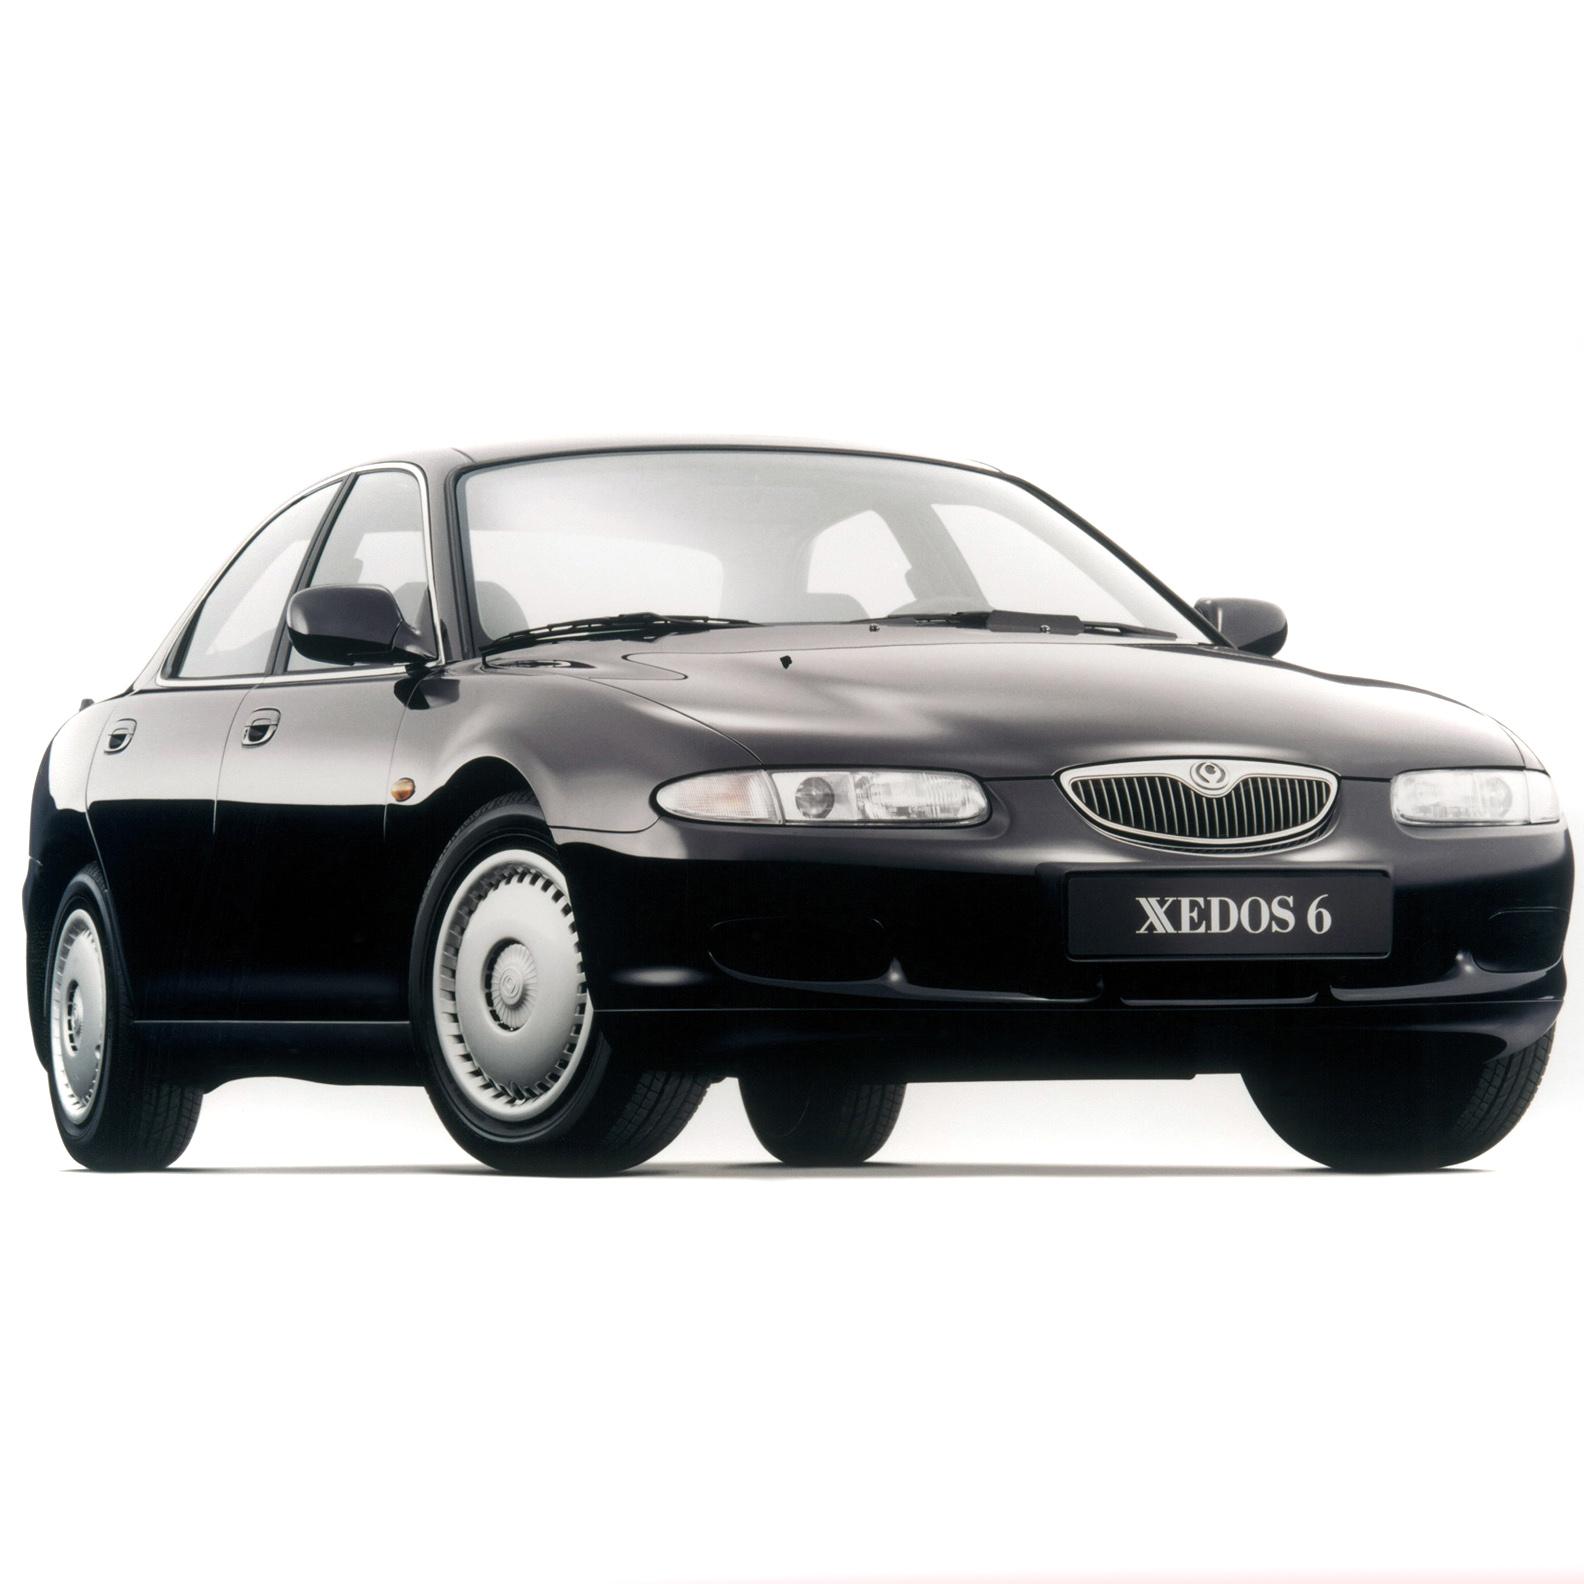 Mazda Xedos 6 1992-2000